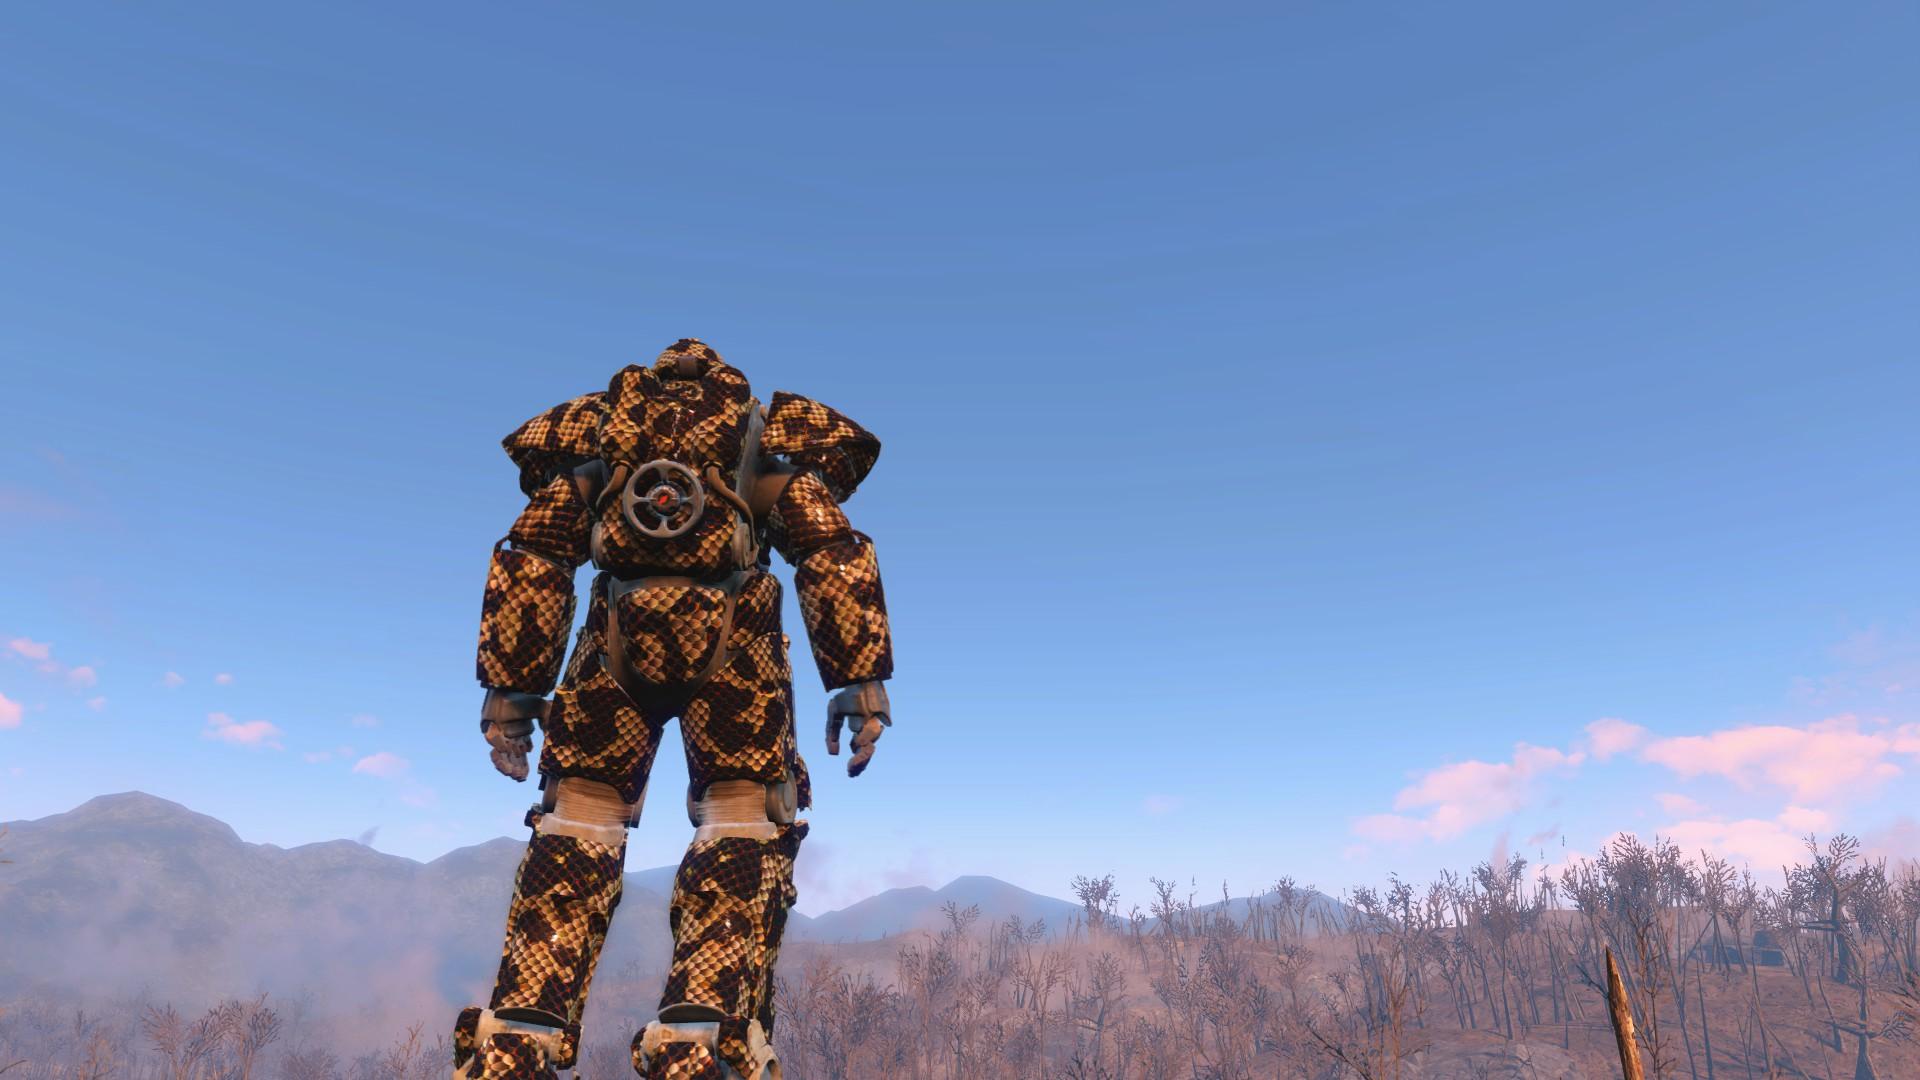 20190421131200_1.jpg - Fallout 4